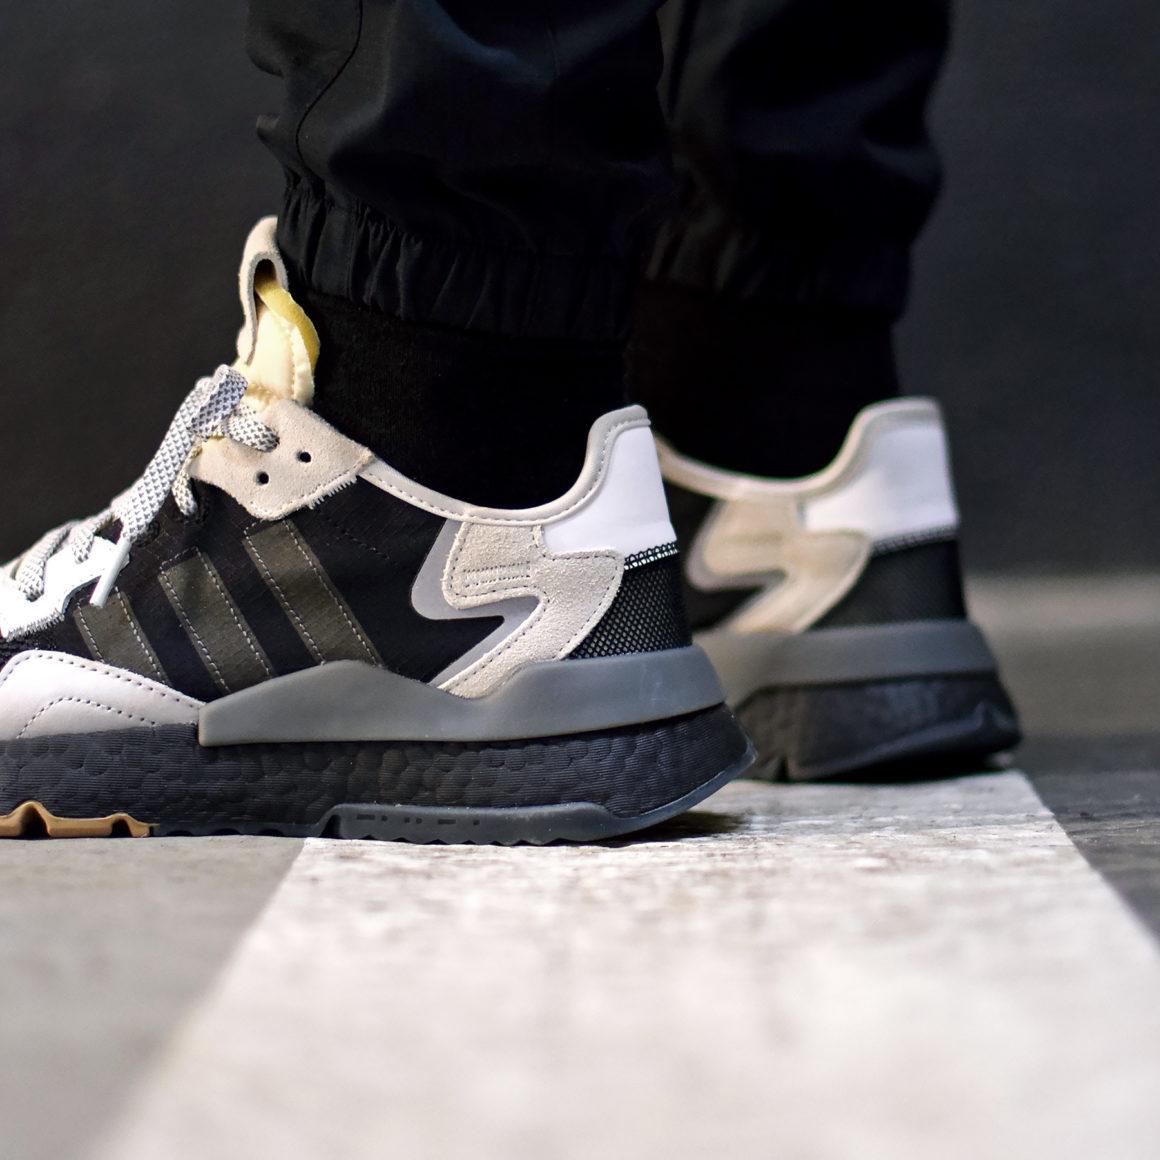 adidas-nite-jogger-black-white-08